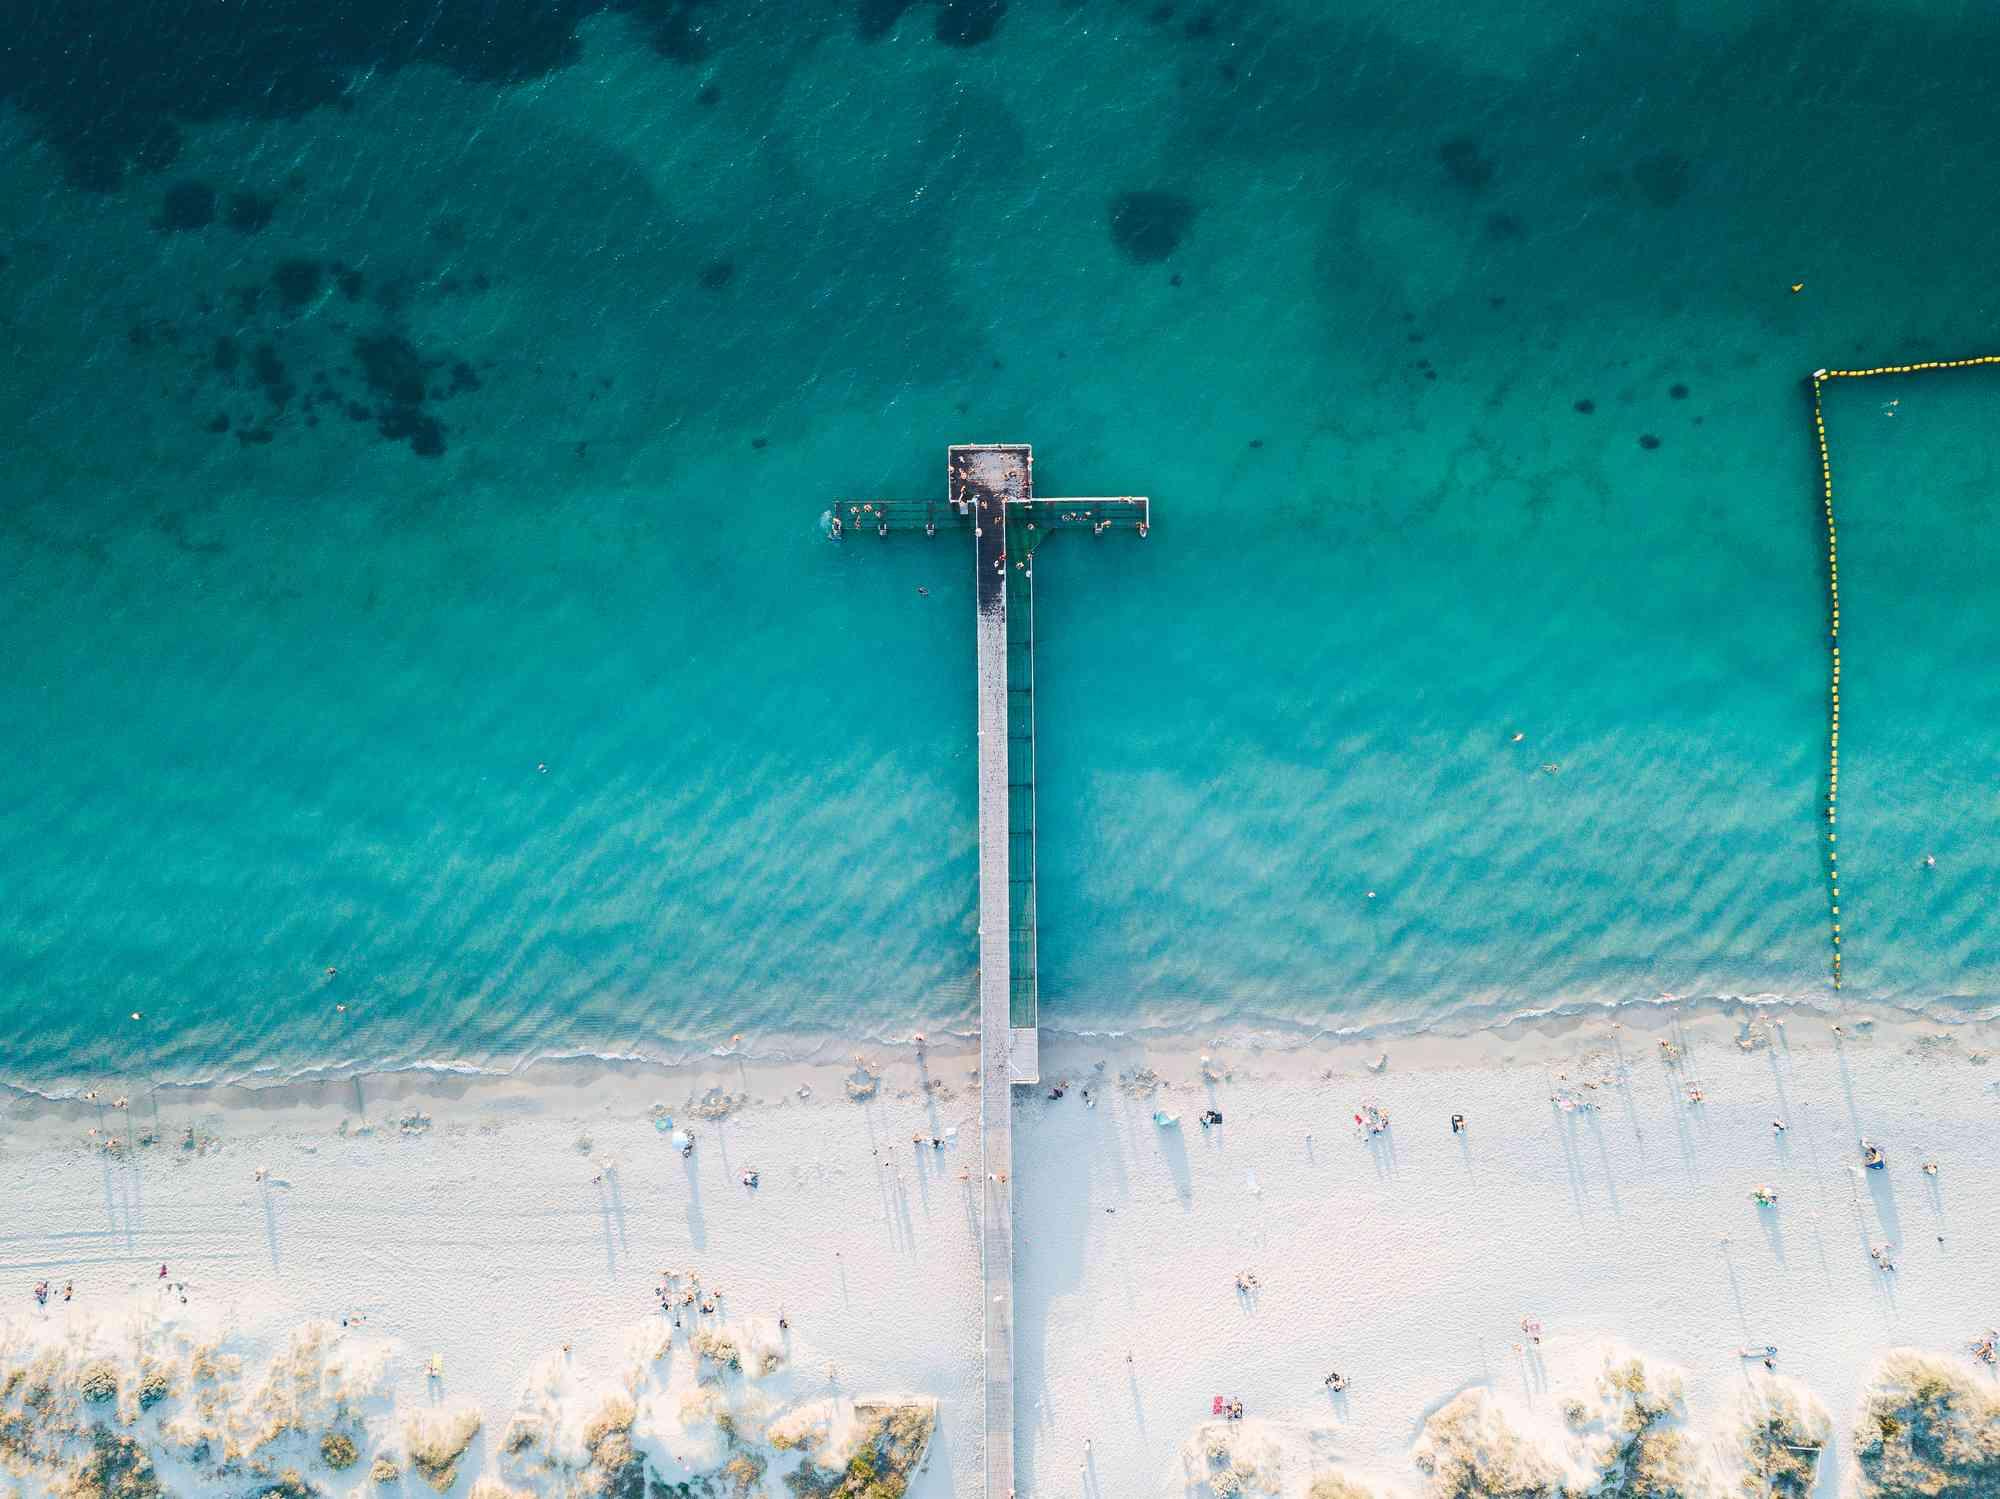 Una playa de arena en la isla Rottnest